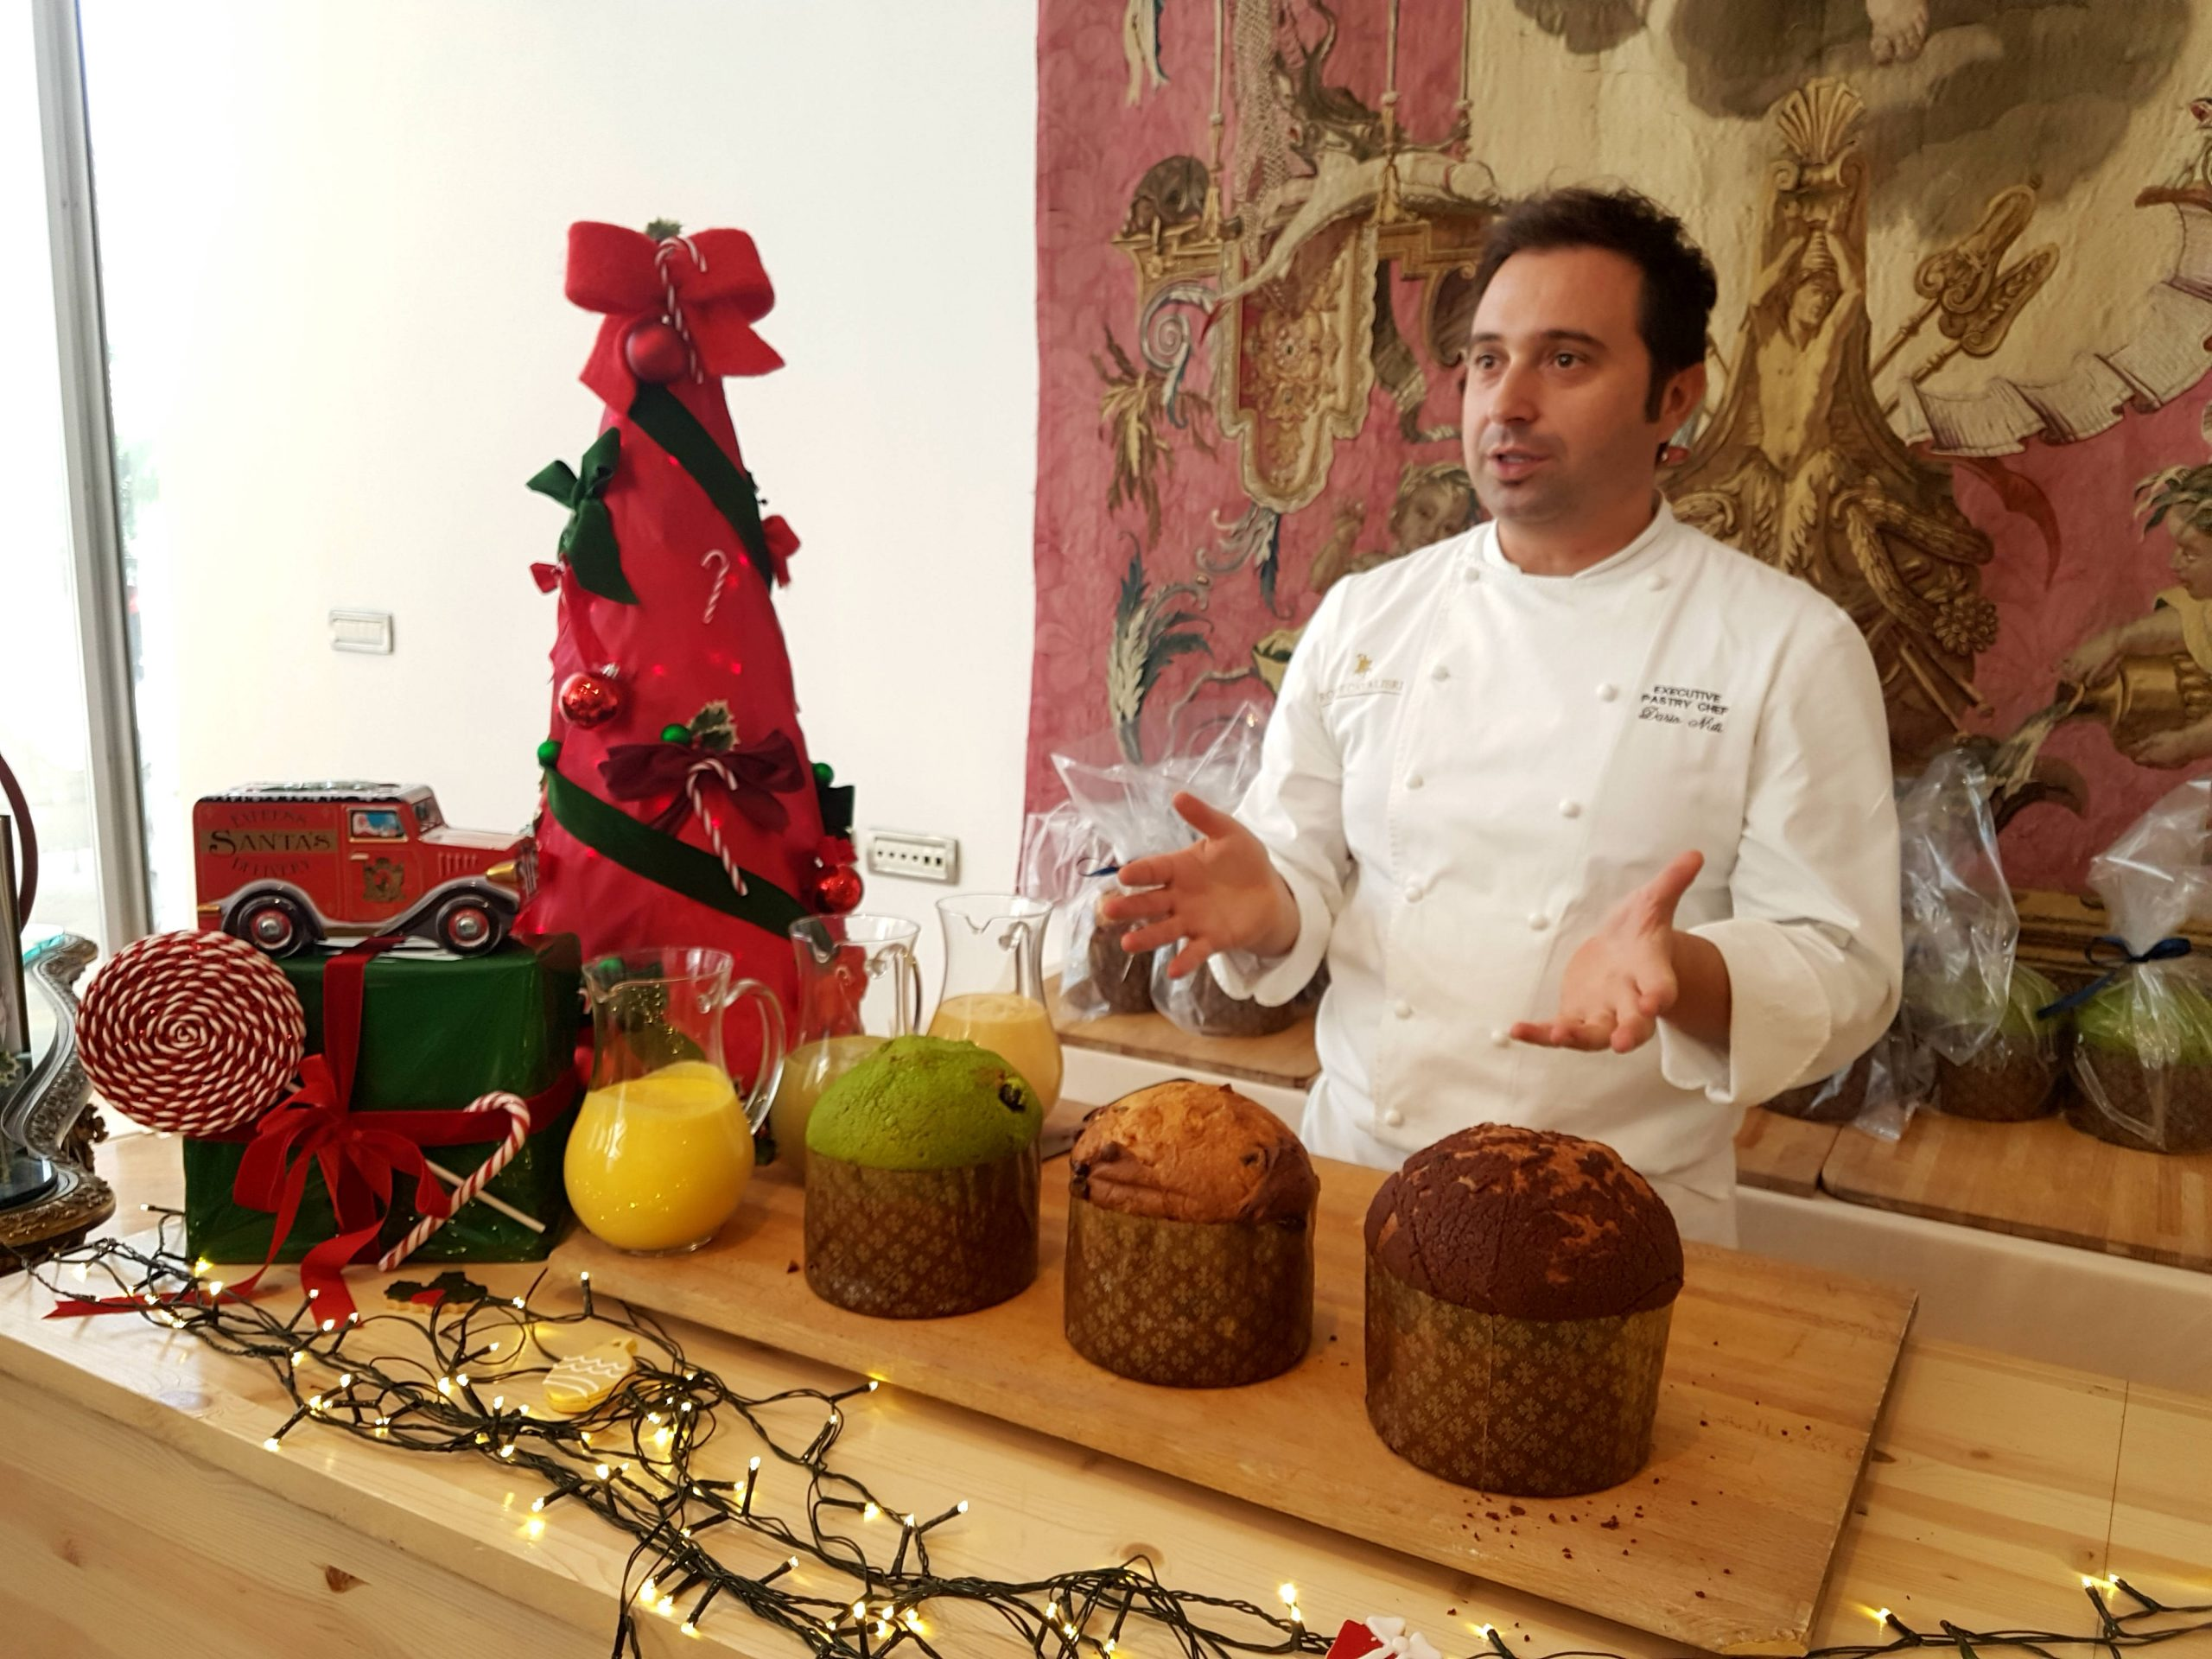 Rome at Christmas - head to the Rome Cavalieri Hotel